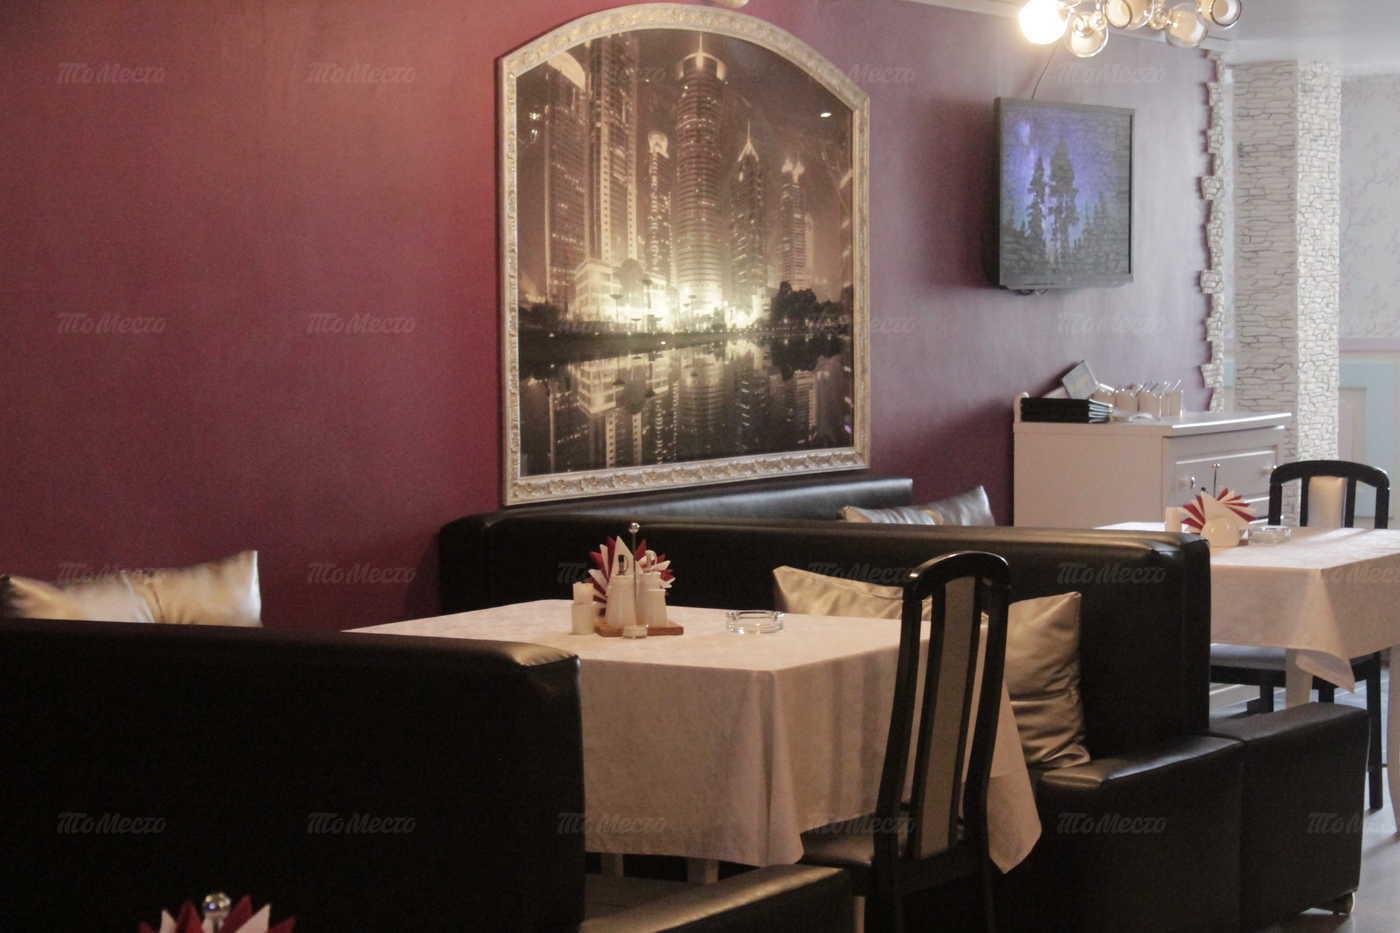 Меню бара, ресторана Empire (Импайер) на проспекте Пятилеток